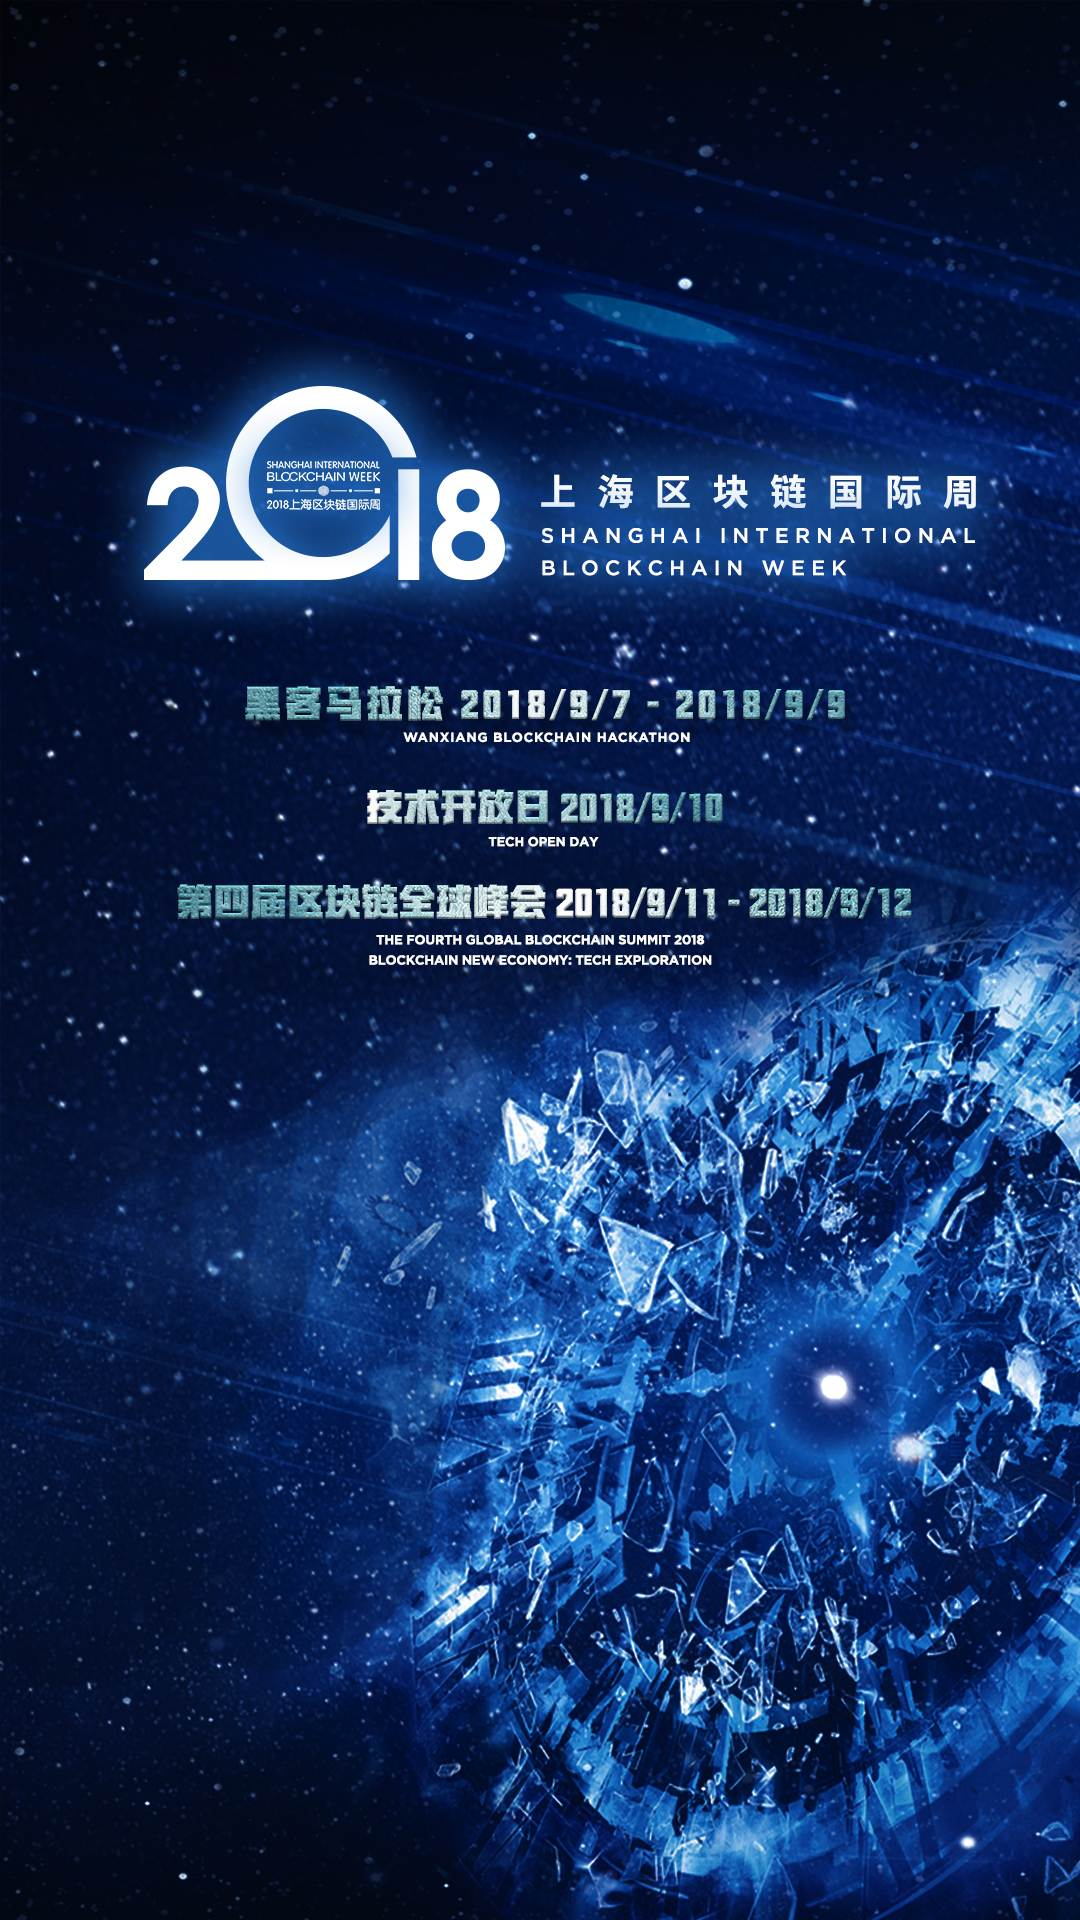 Shanghai International Blockchain Week 2018 Beijing Special Deal 4 Days Dept 11 Aug 18